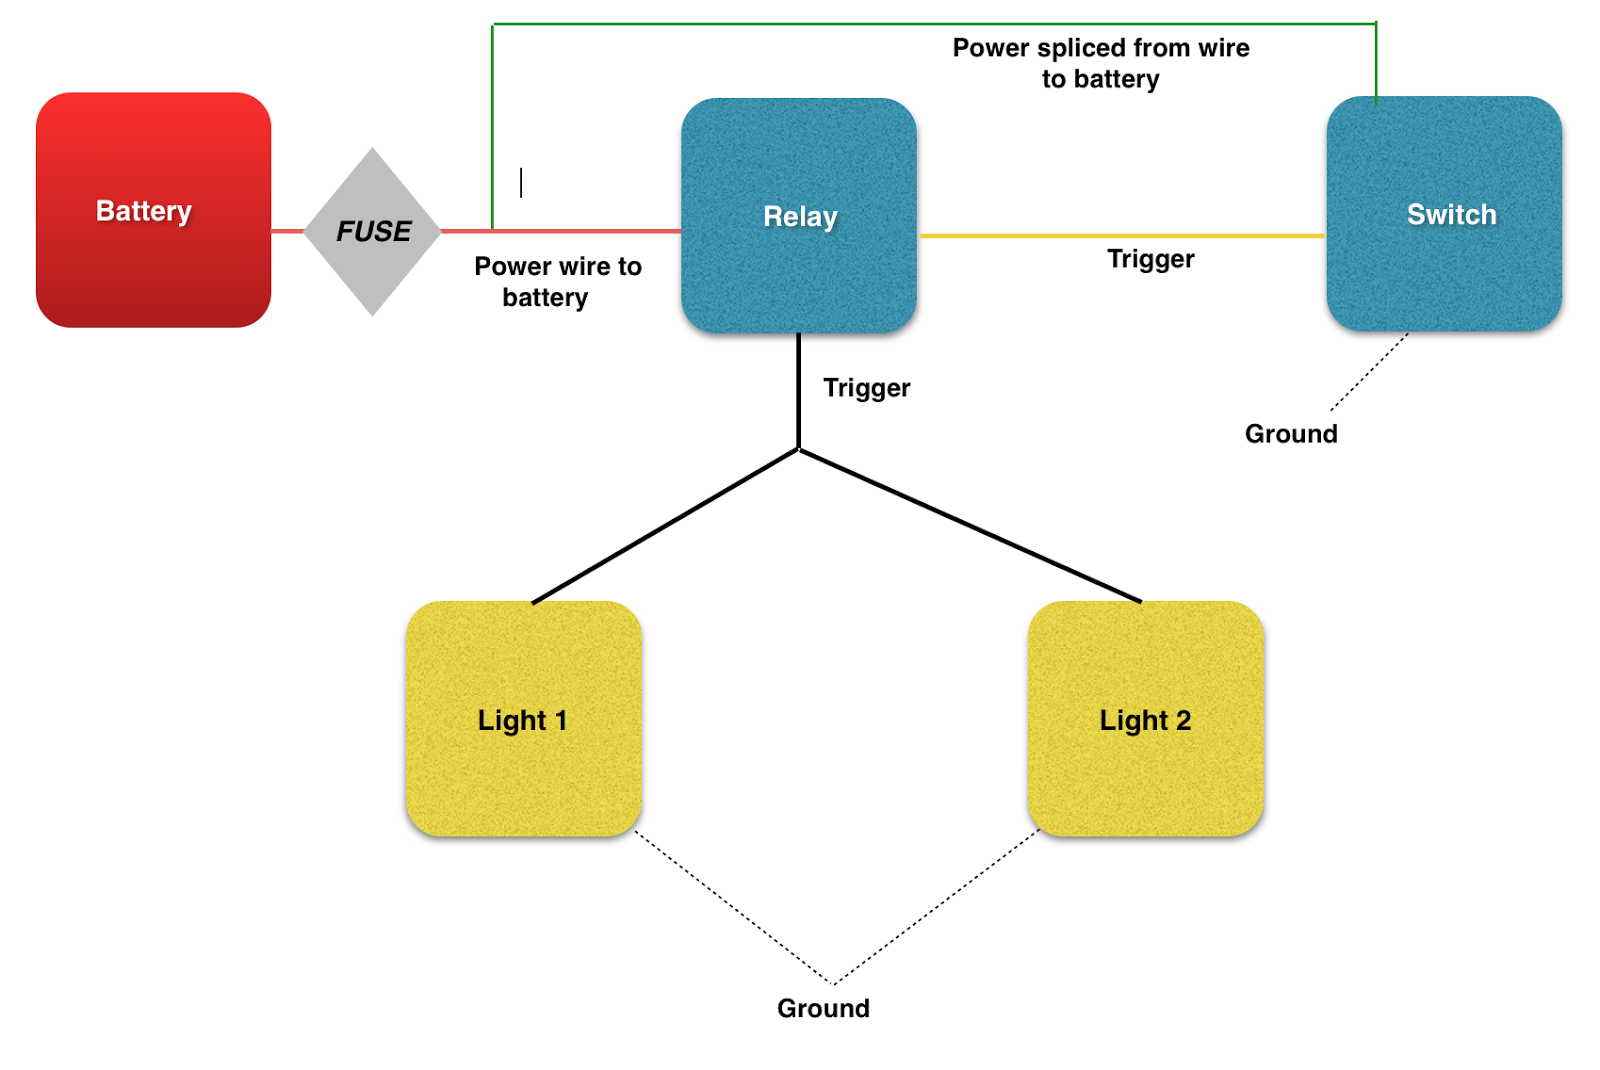 Hazard flasher diagrams u hella picturesque png 1600x1070 Hazard flasher  diagrams u2022 hella picturesque